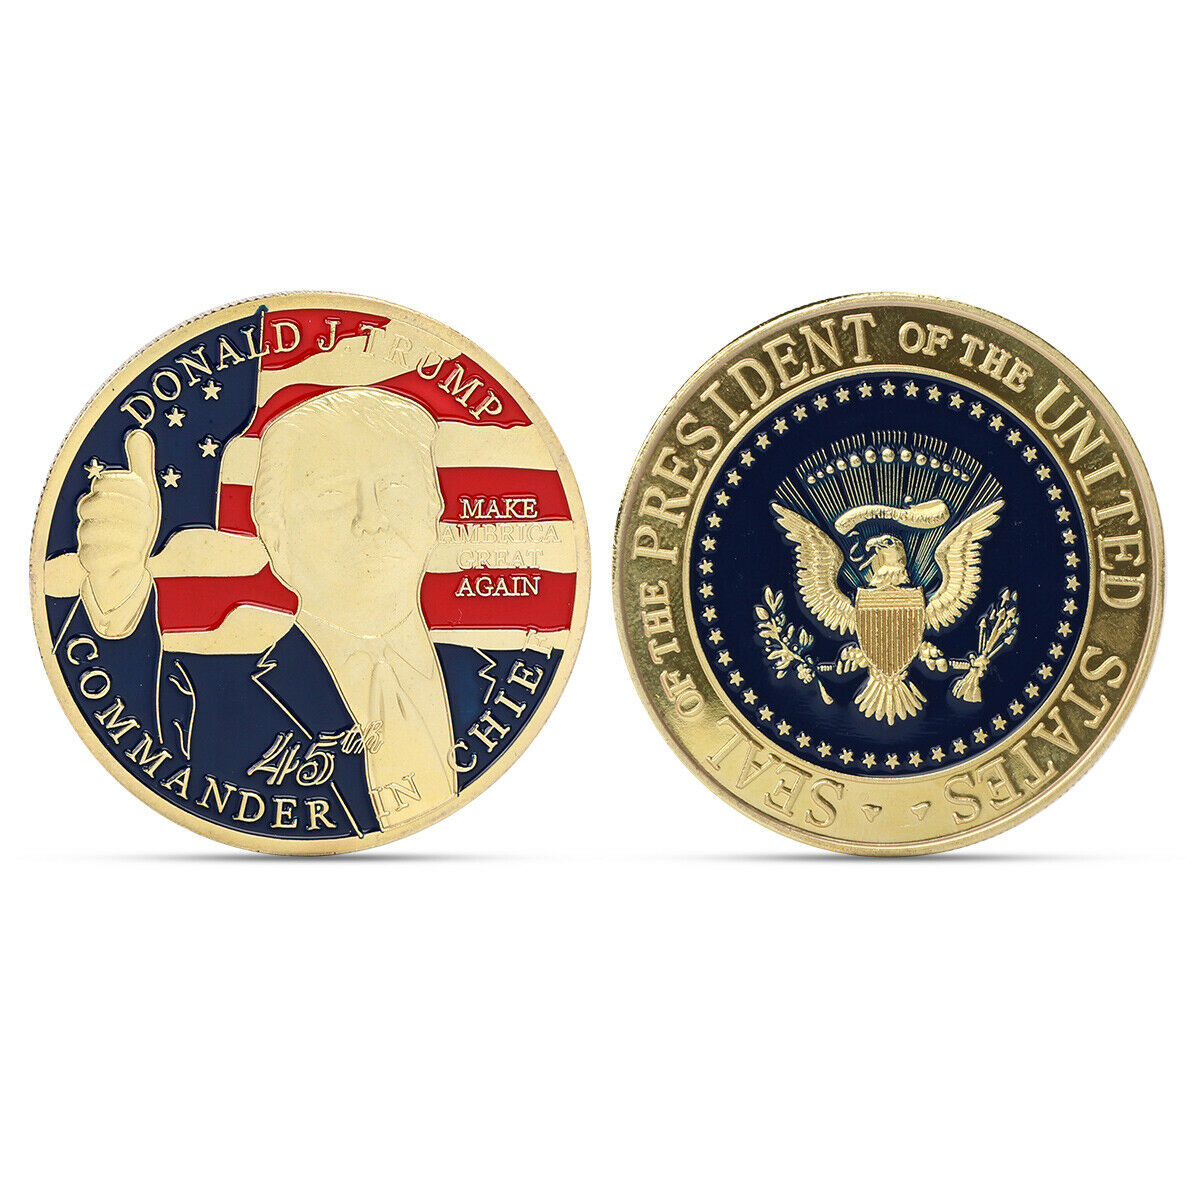 1PC 45th Donald Trump Gold Plated Make America Great Again Commemorartive Coin Q